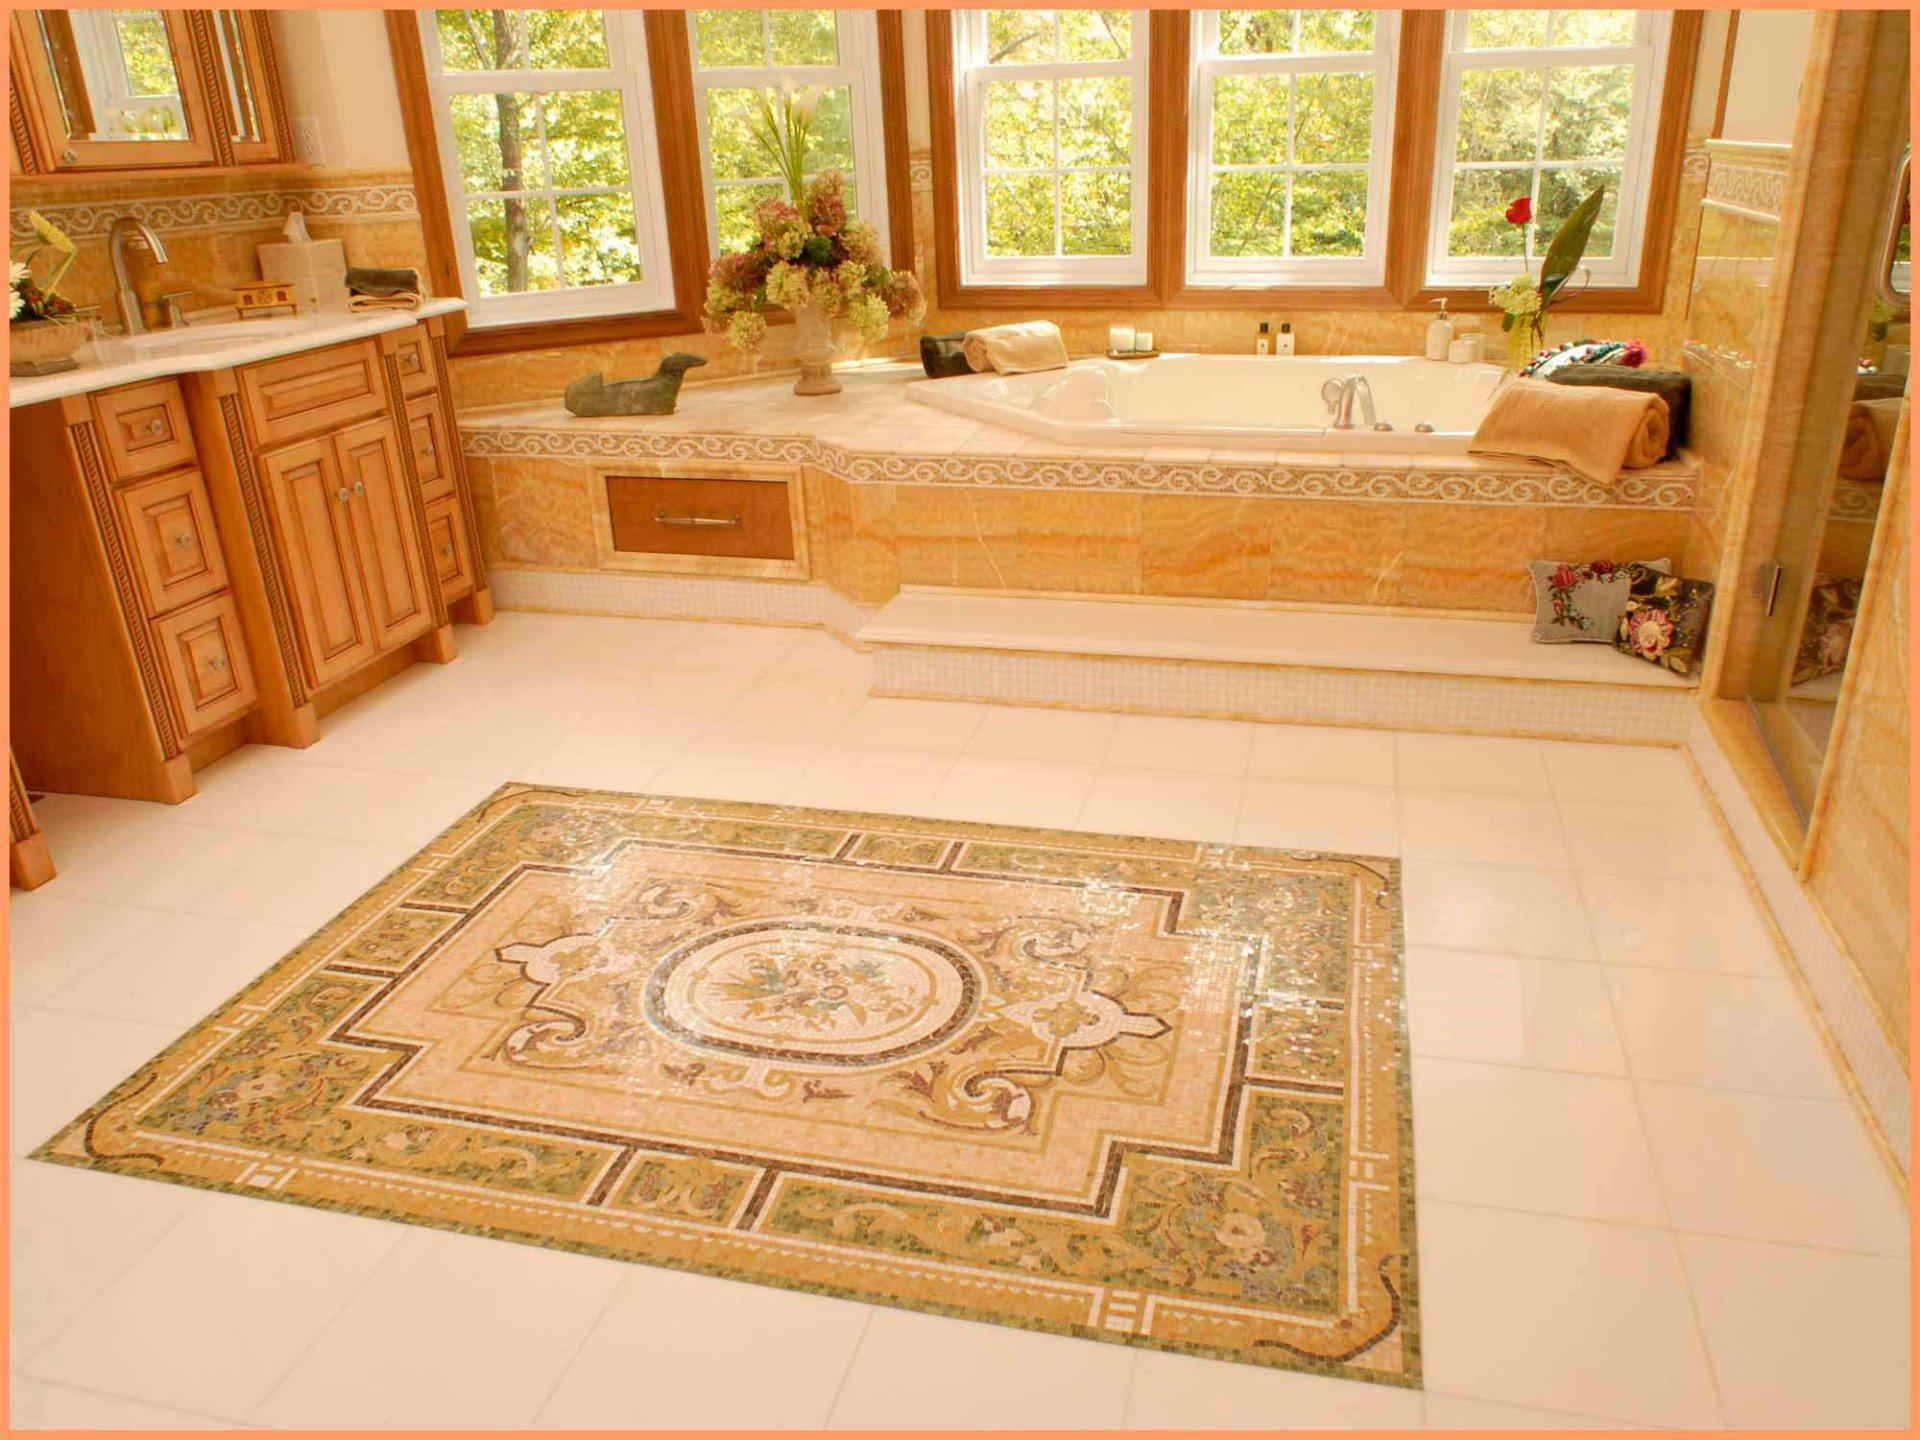 Middletown Ceramic Tile Co Middletown Ct 06457 Tile Gallerystore